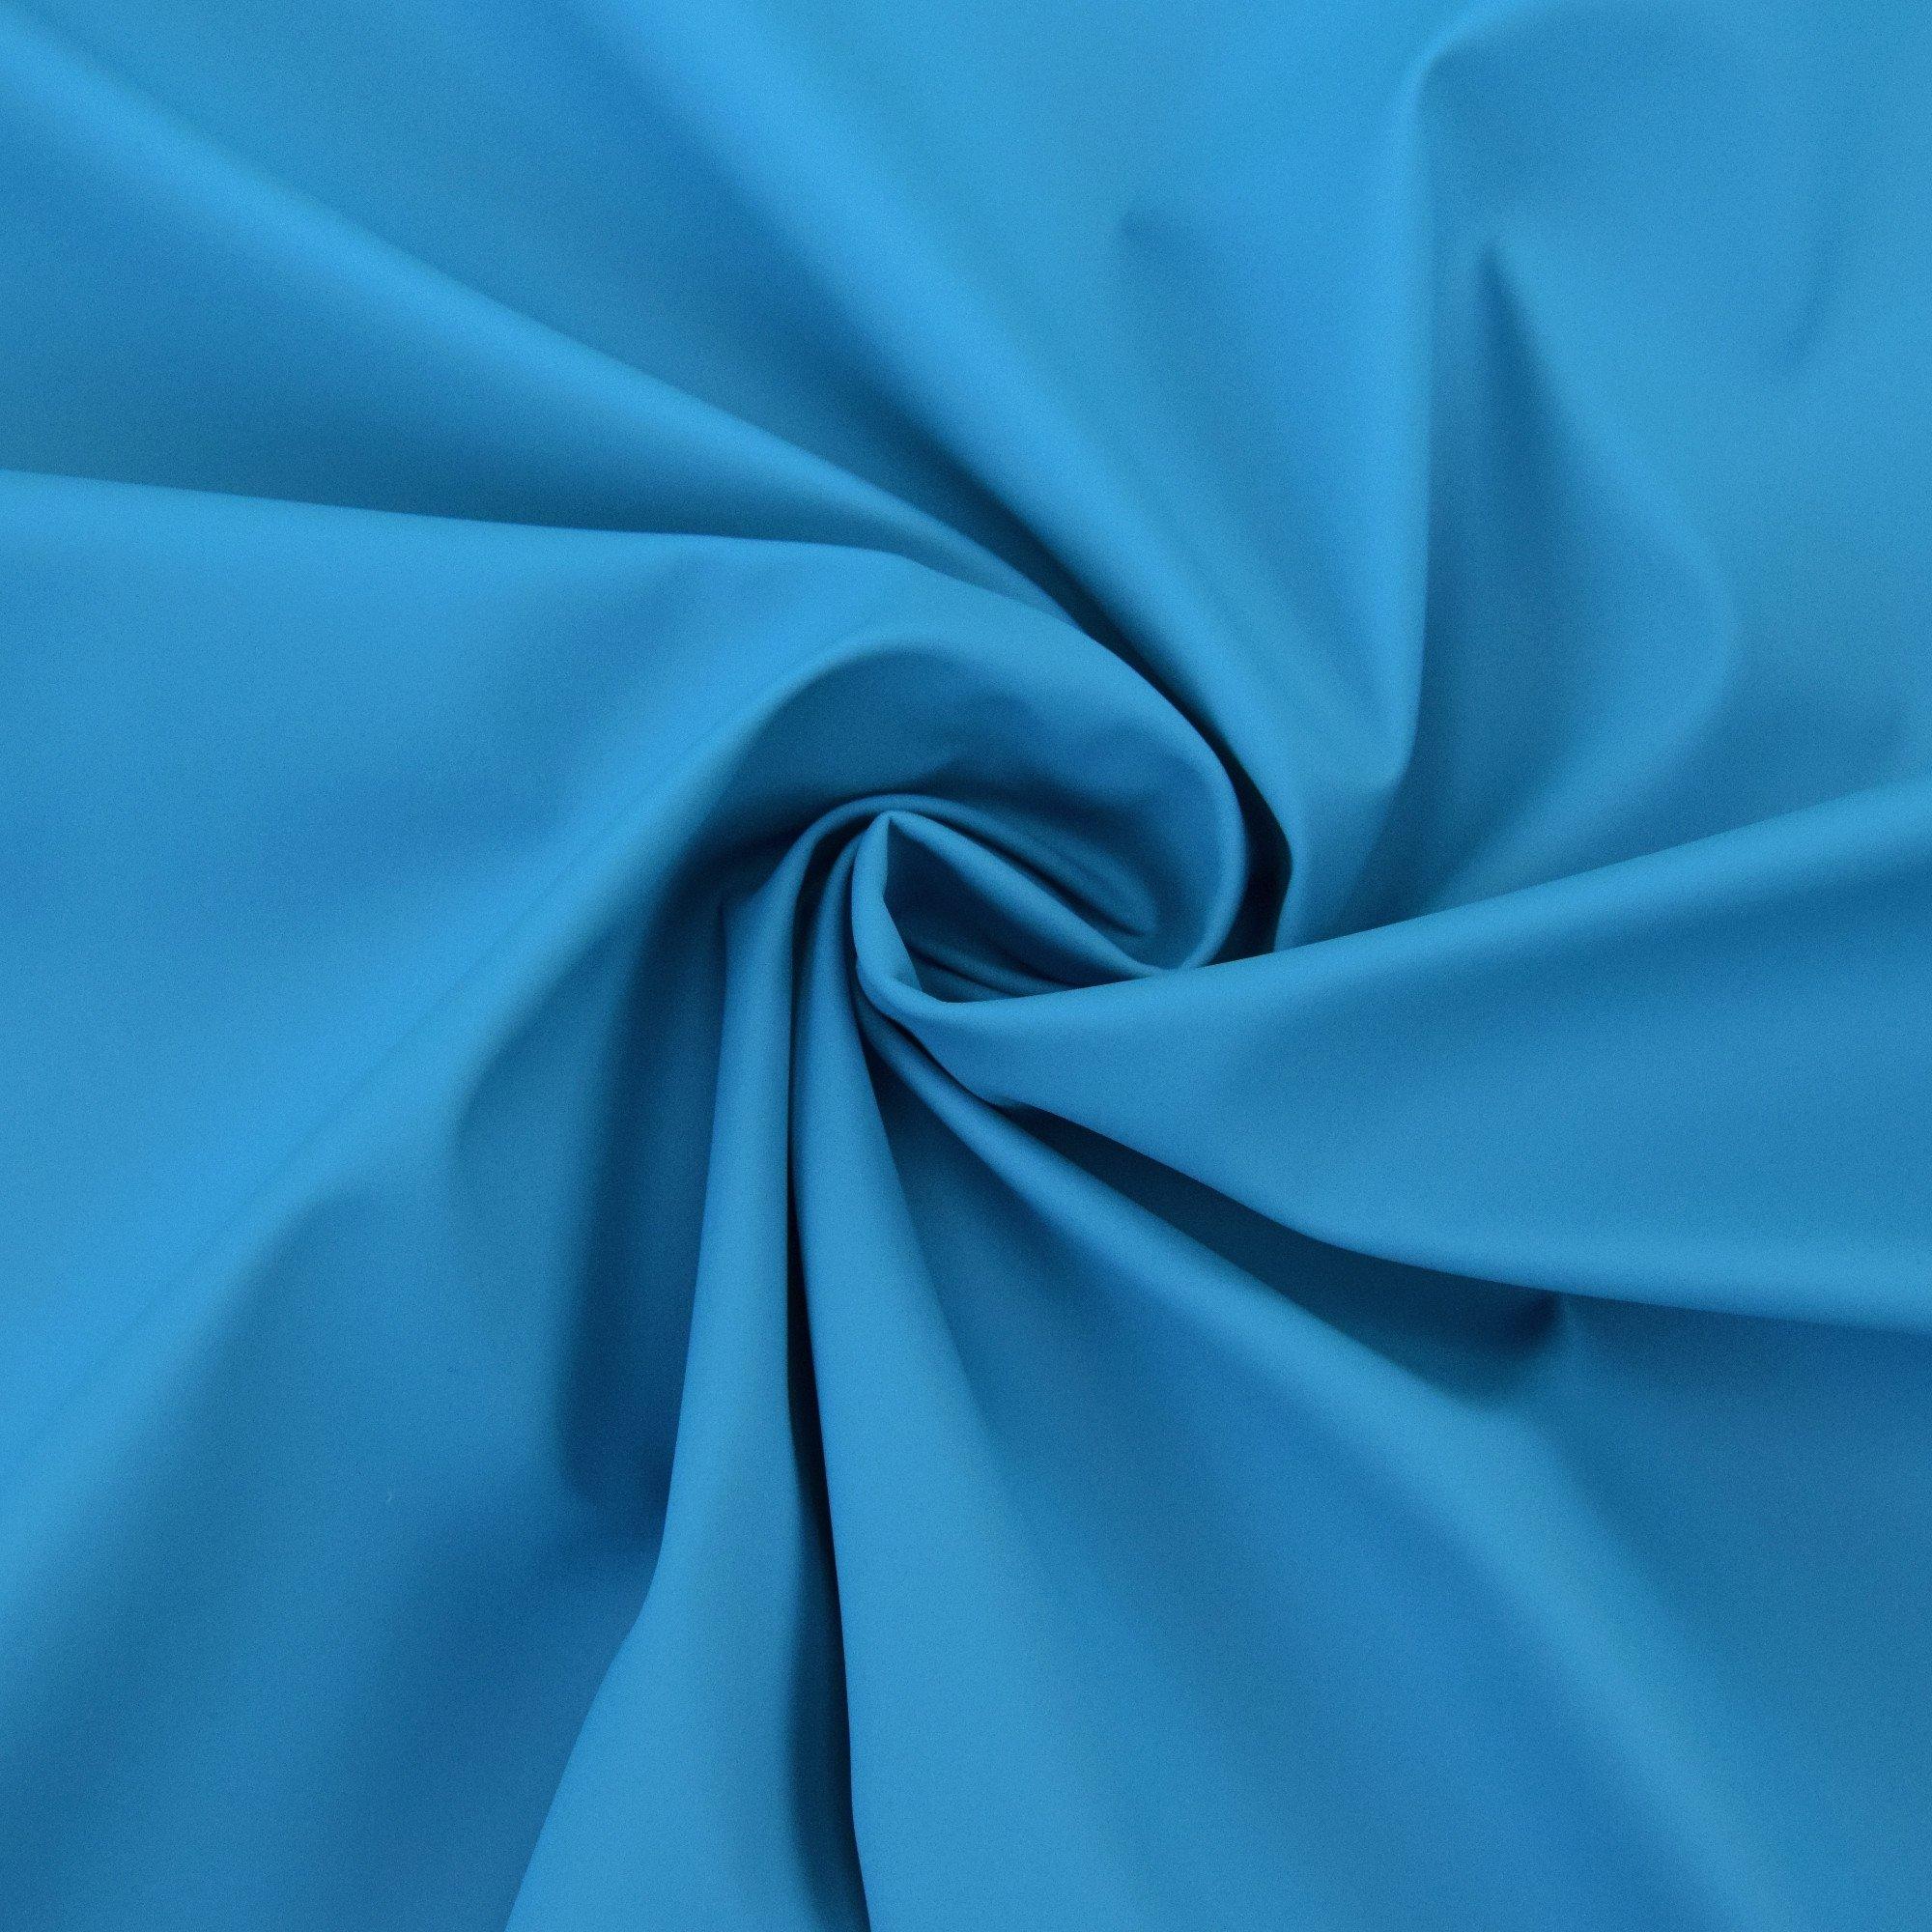 Regenjacke, blau